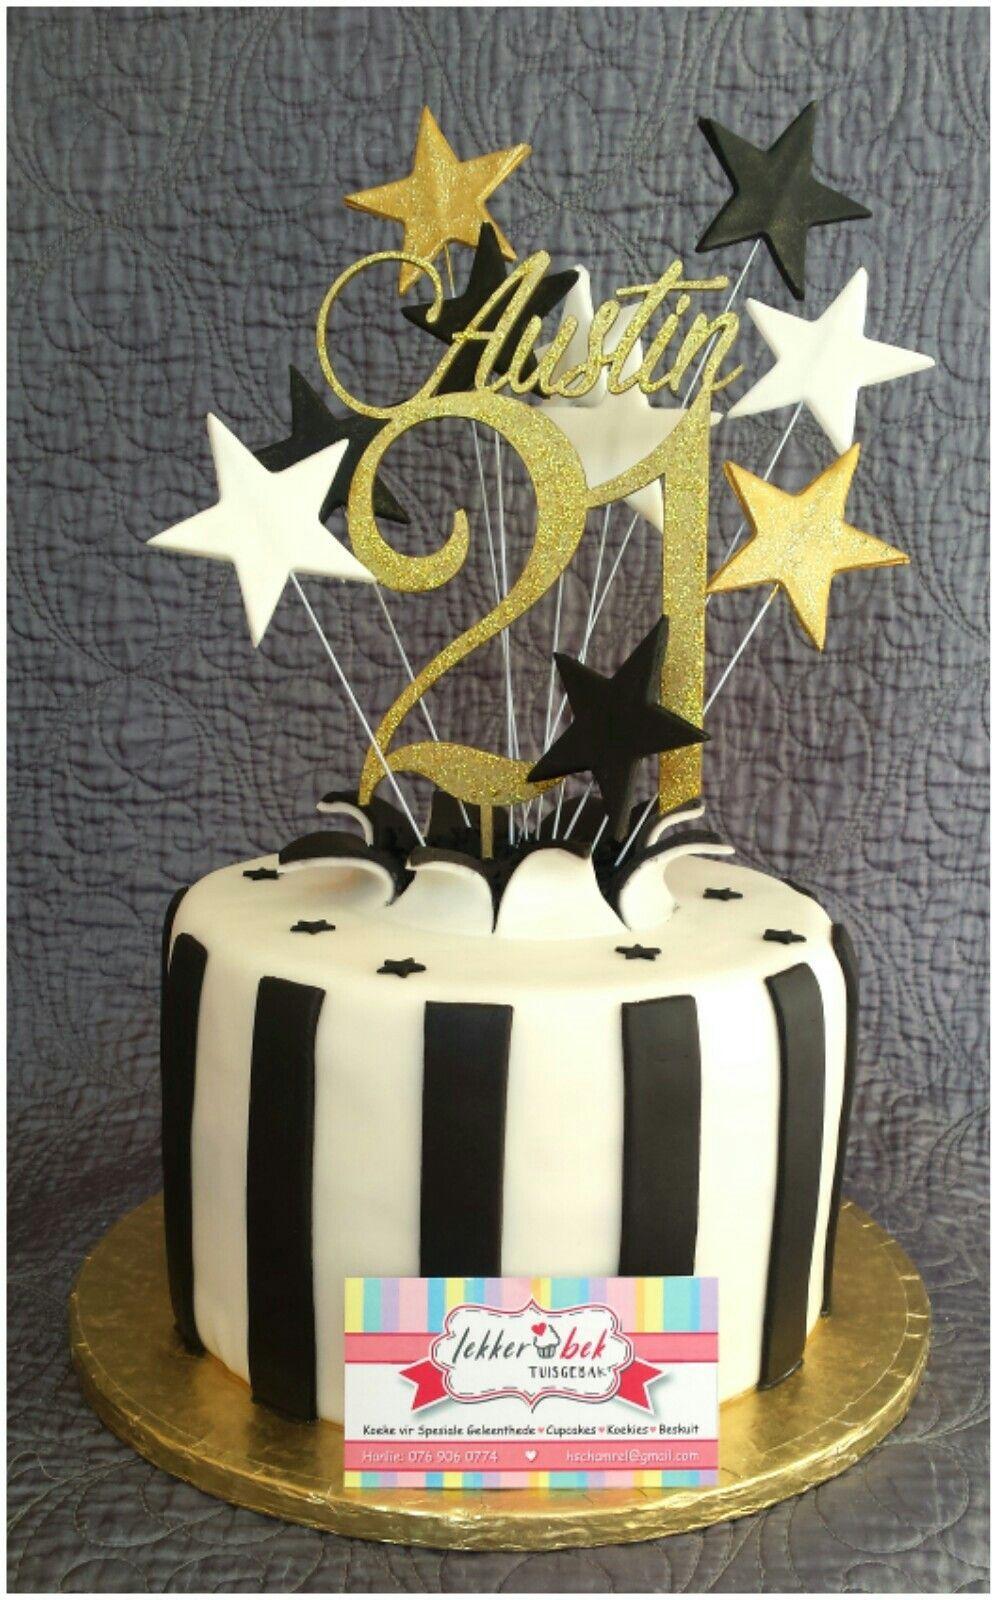 21st birthday cake 21st birthday cakes, 21st birthday